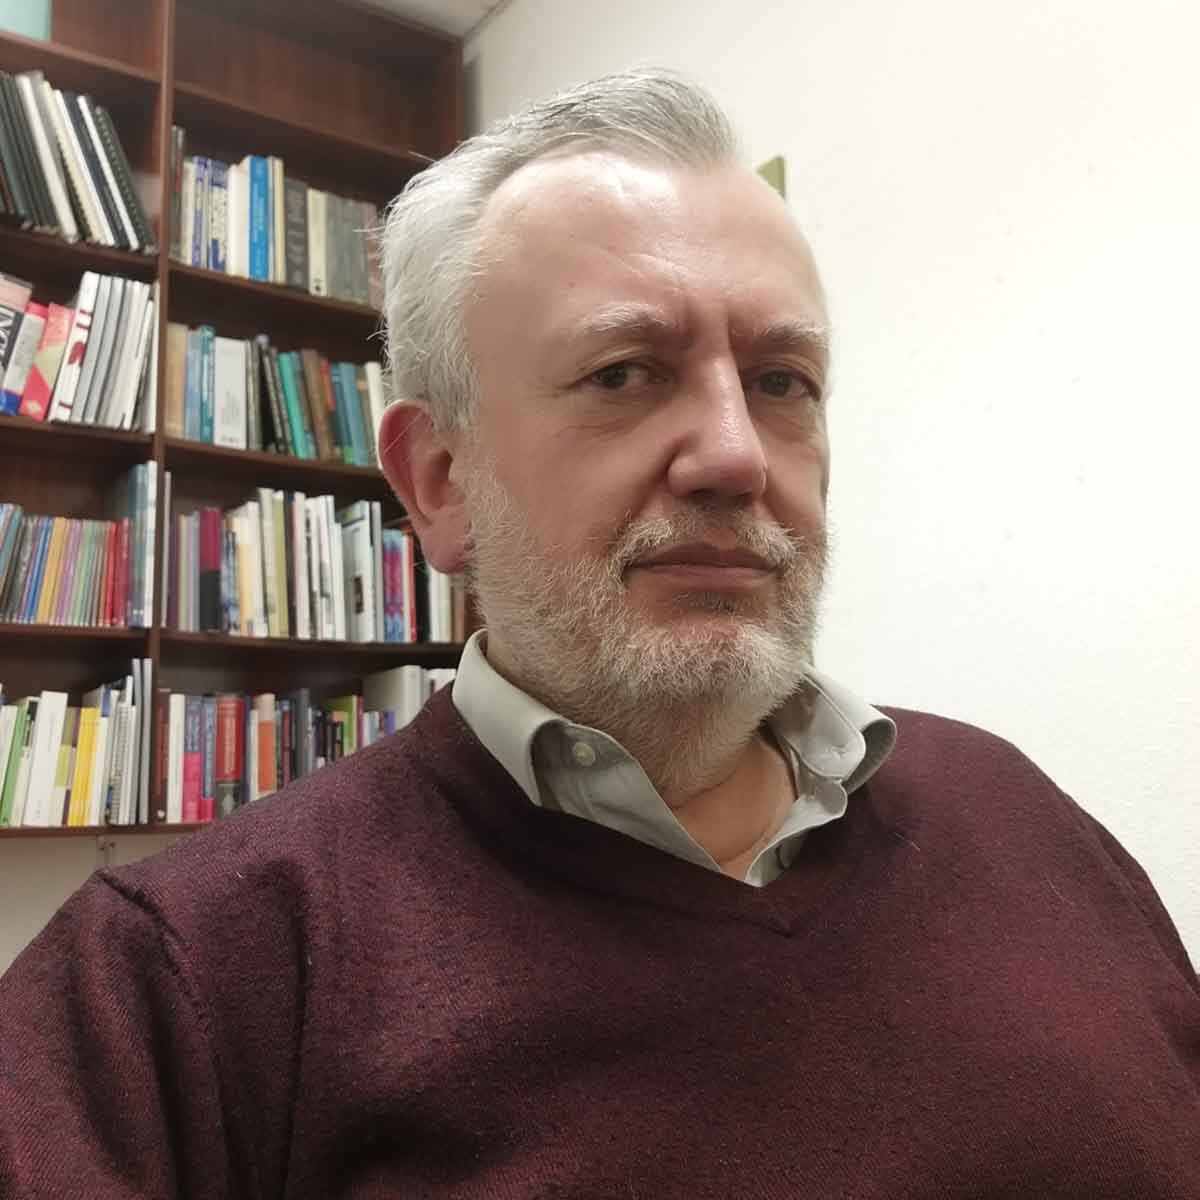 Pedro Serena, experto en nanotecnología